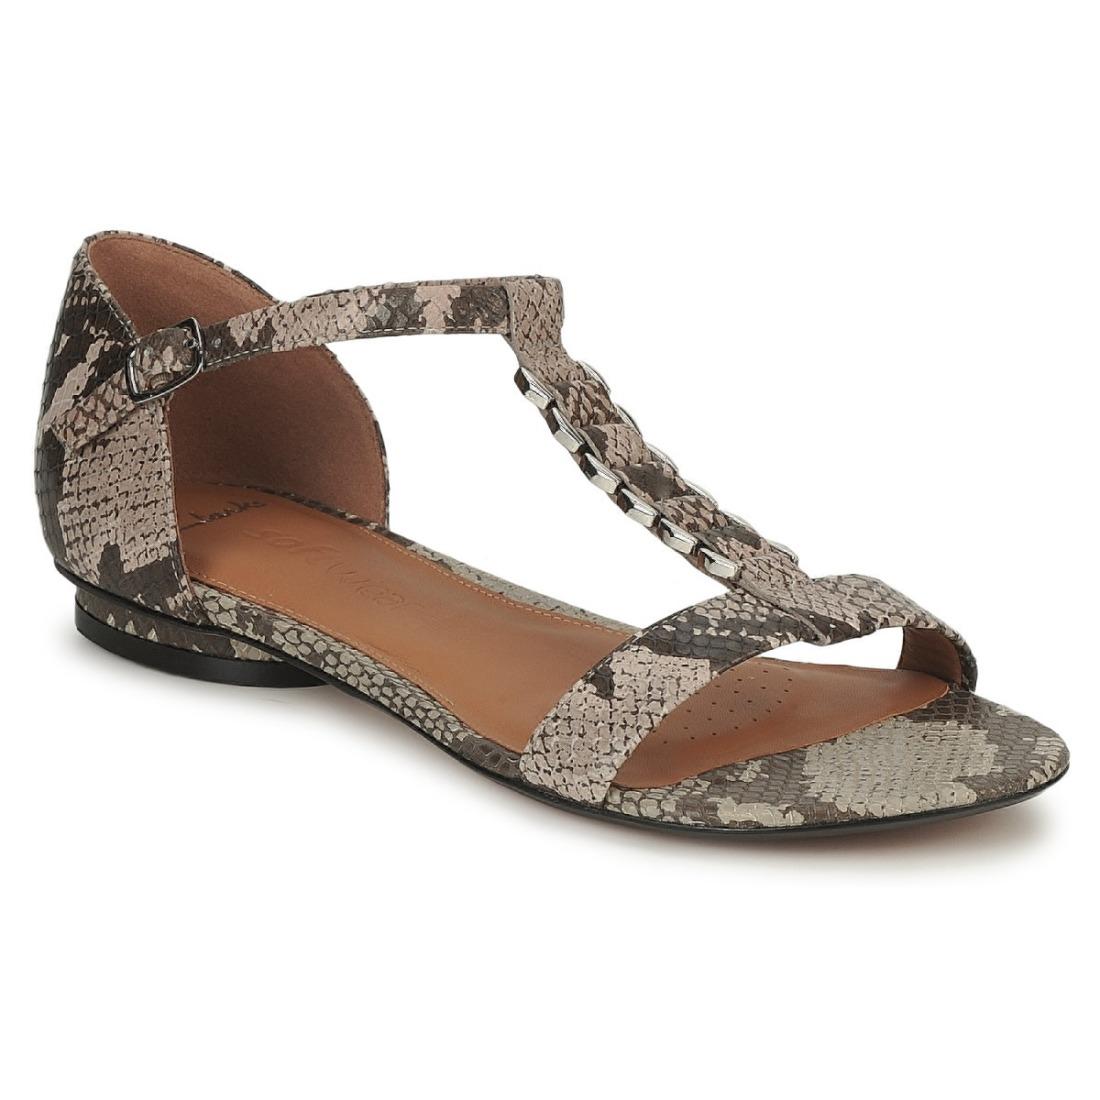 Clarks sandals, £44.99, clarks.co.uk BUY ME HERE!